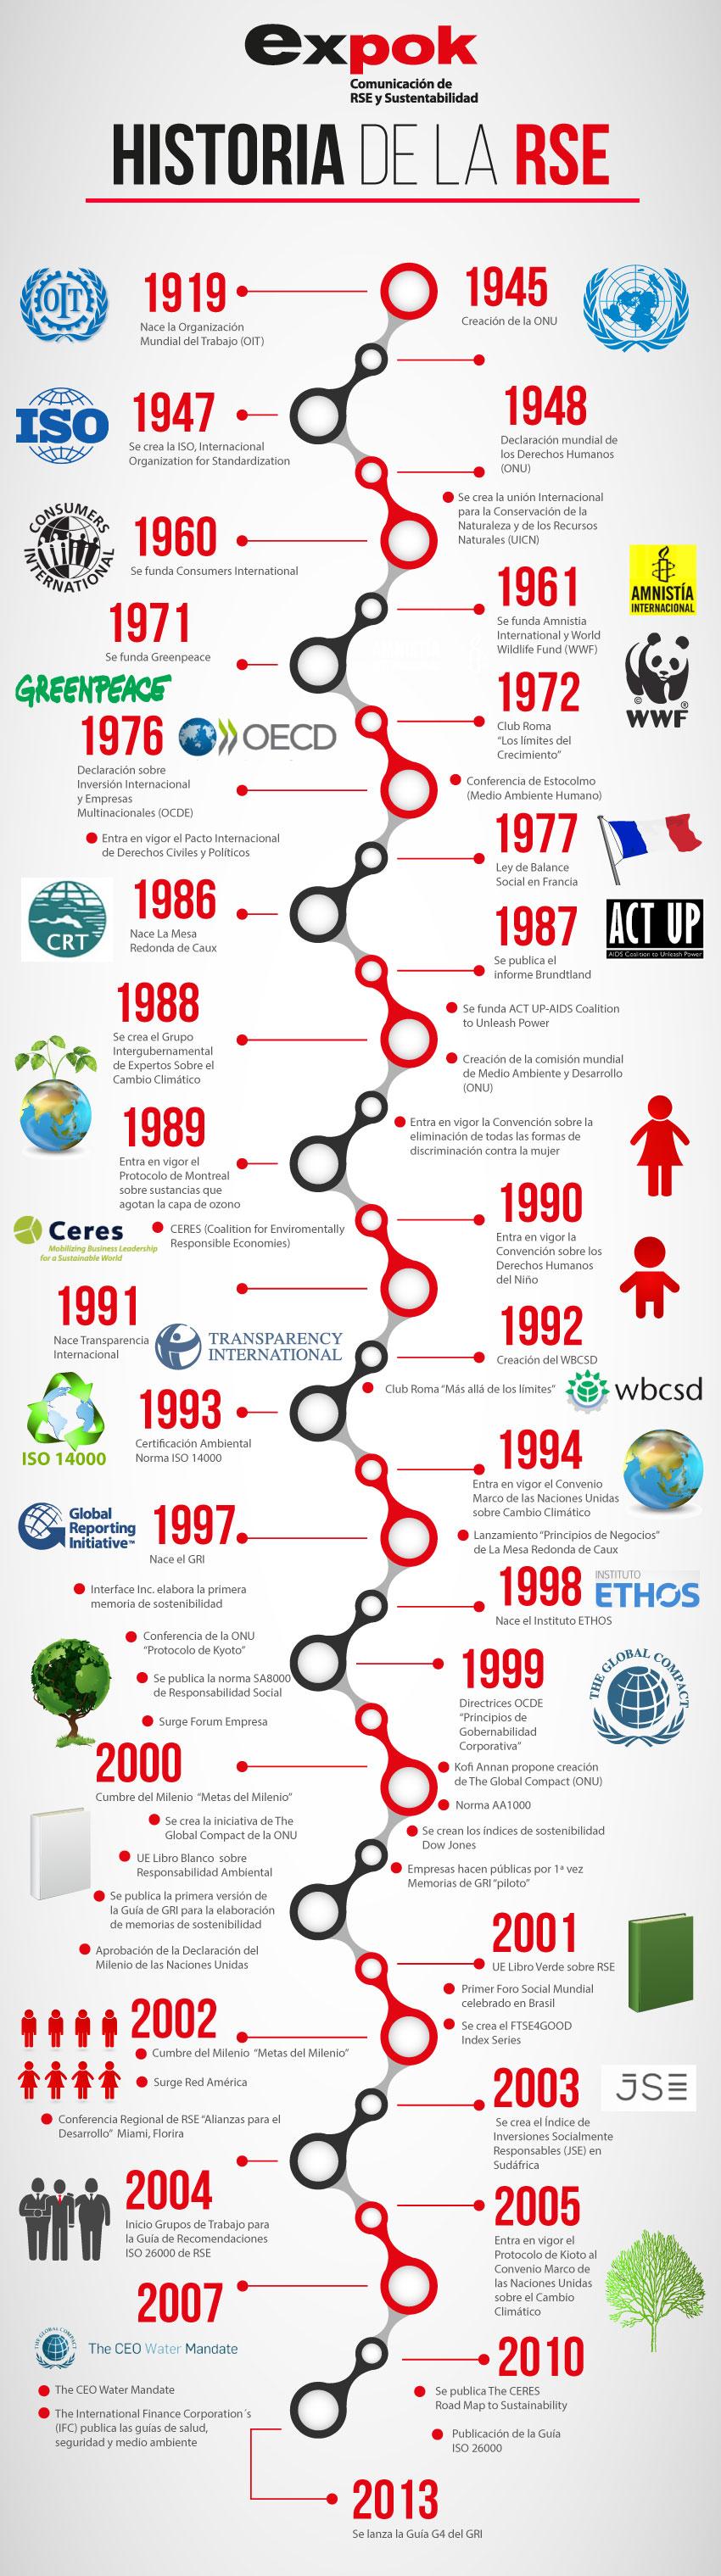 Historia de la Responsabilidad Social Empresarial (RSE)